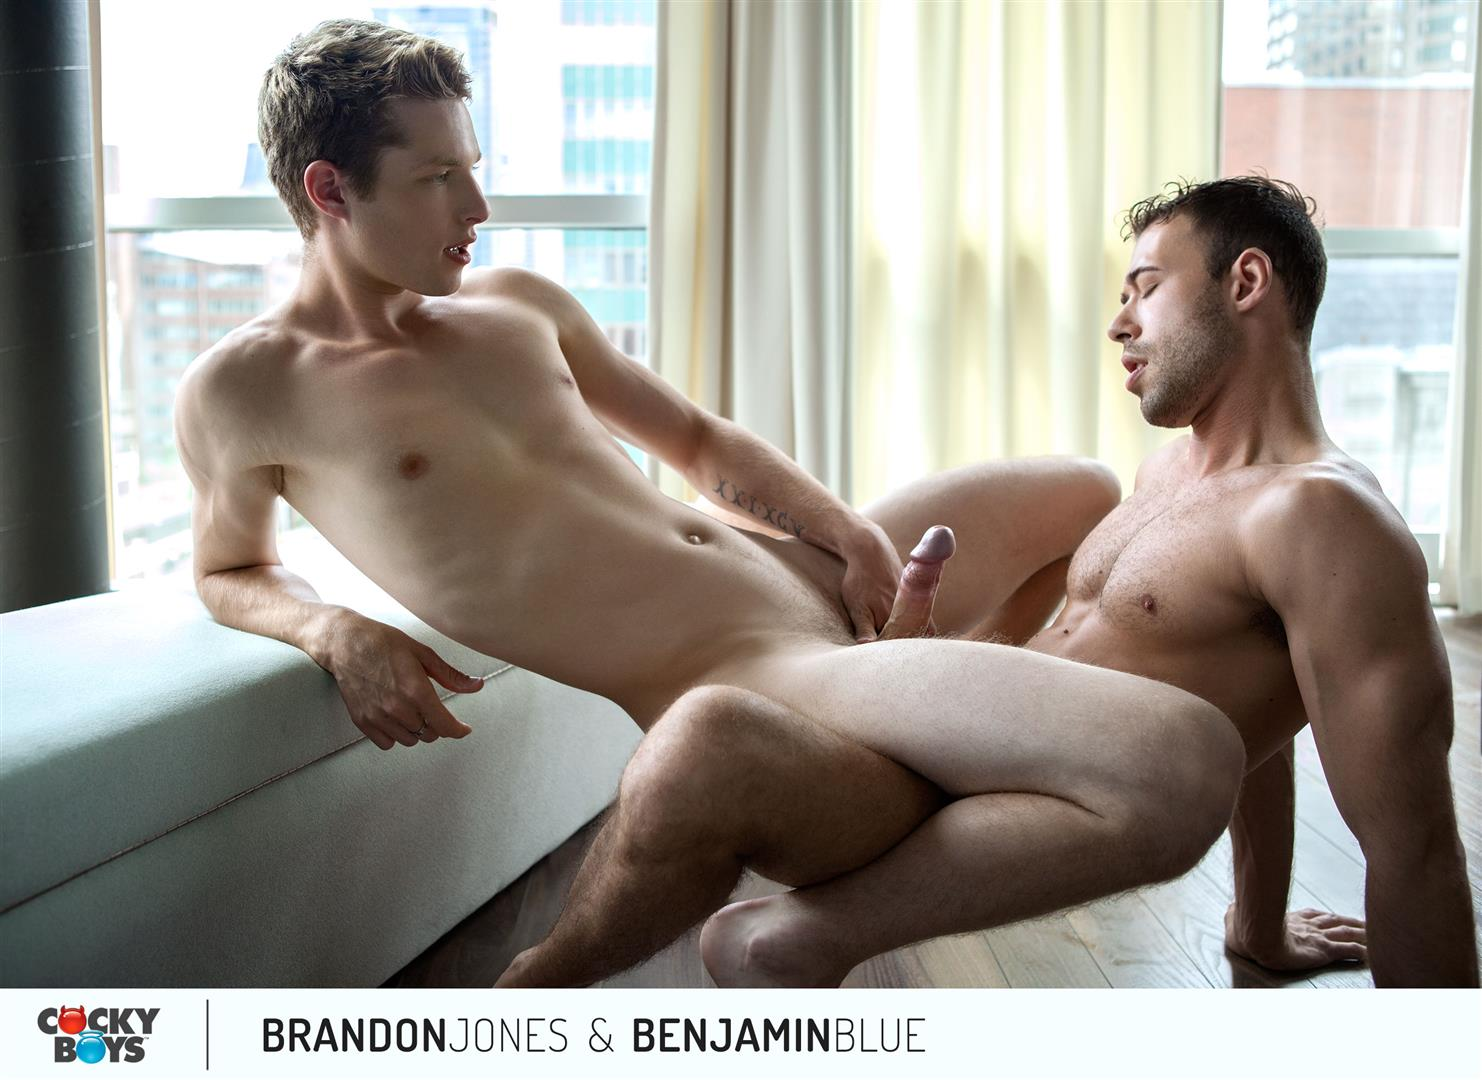 Cockyboys-Benjamin-Blue-and-Brandon-Jones-Flip-Flop-Fuck-Amateur-Gay-Porn-23 Cockyboys: Benjamin Blue Tops Brandon Jones For The First Time